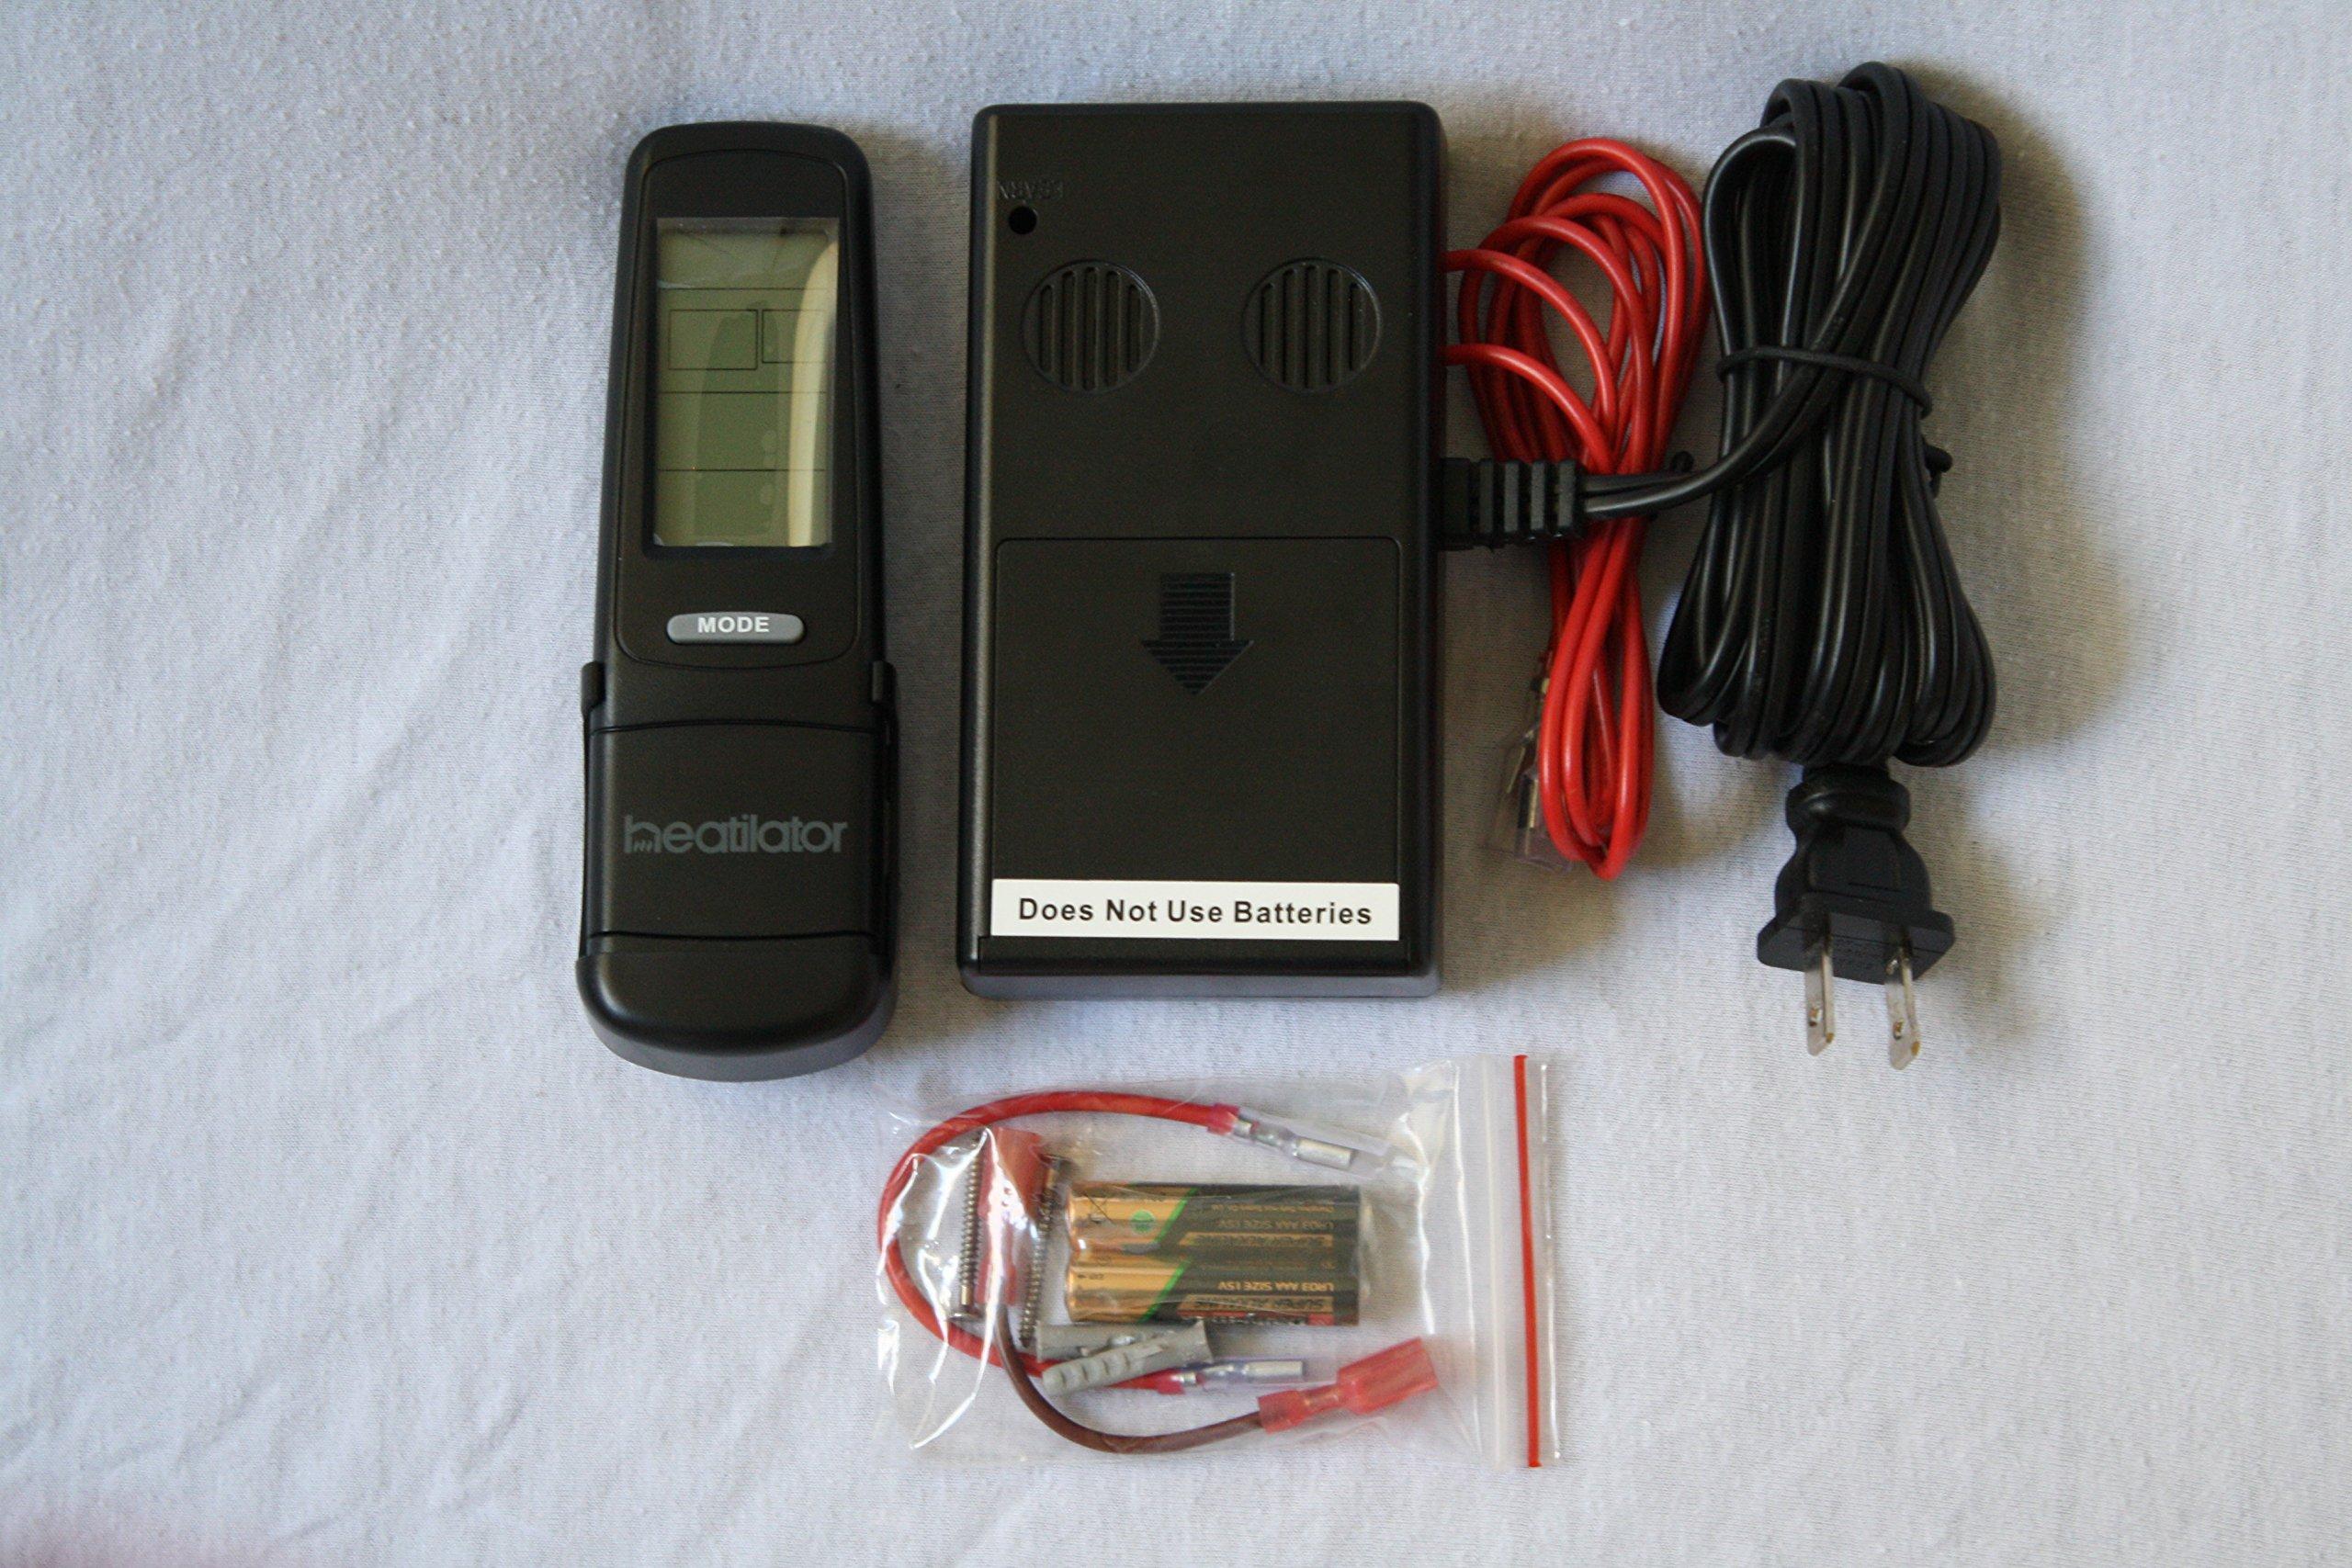 Heatilator Smart Stat HTL Fireplace Remote Control Heat & Glo by Heatilator